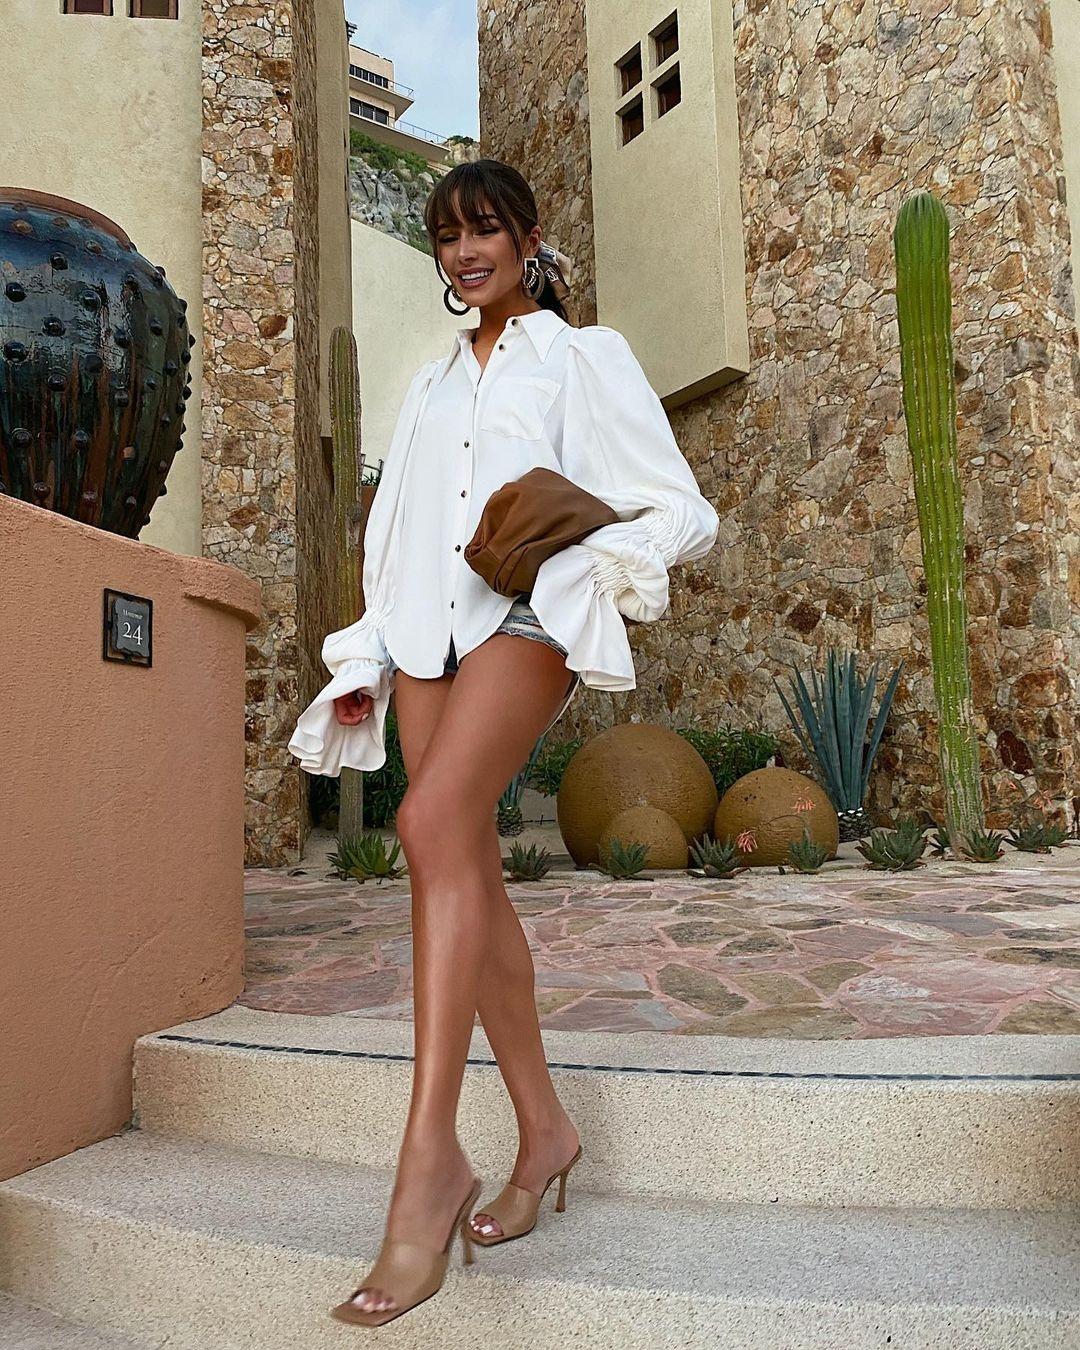 Olivia Culpo donning Nude Bottega Veneta open toe sandals with high heel